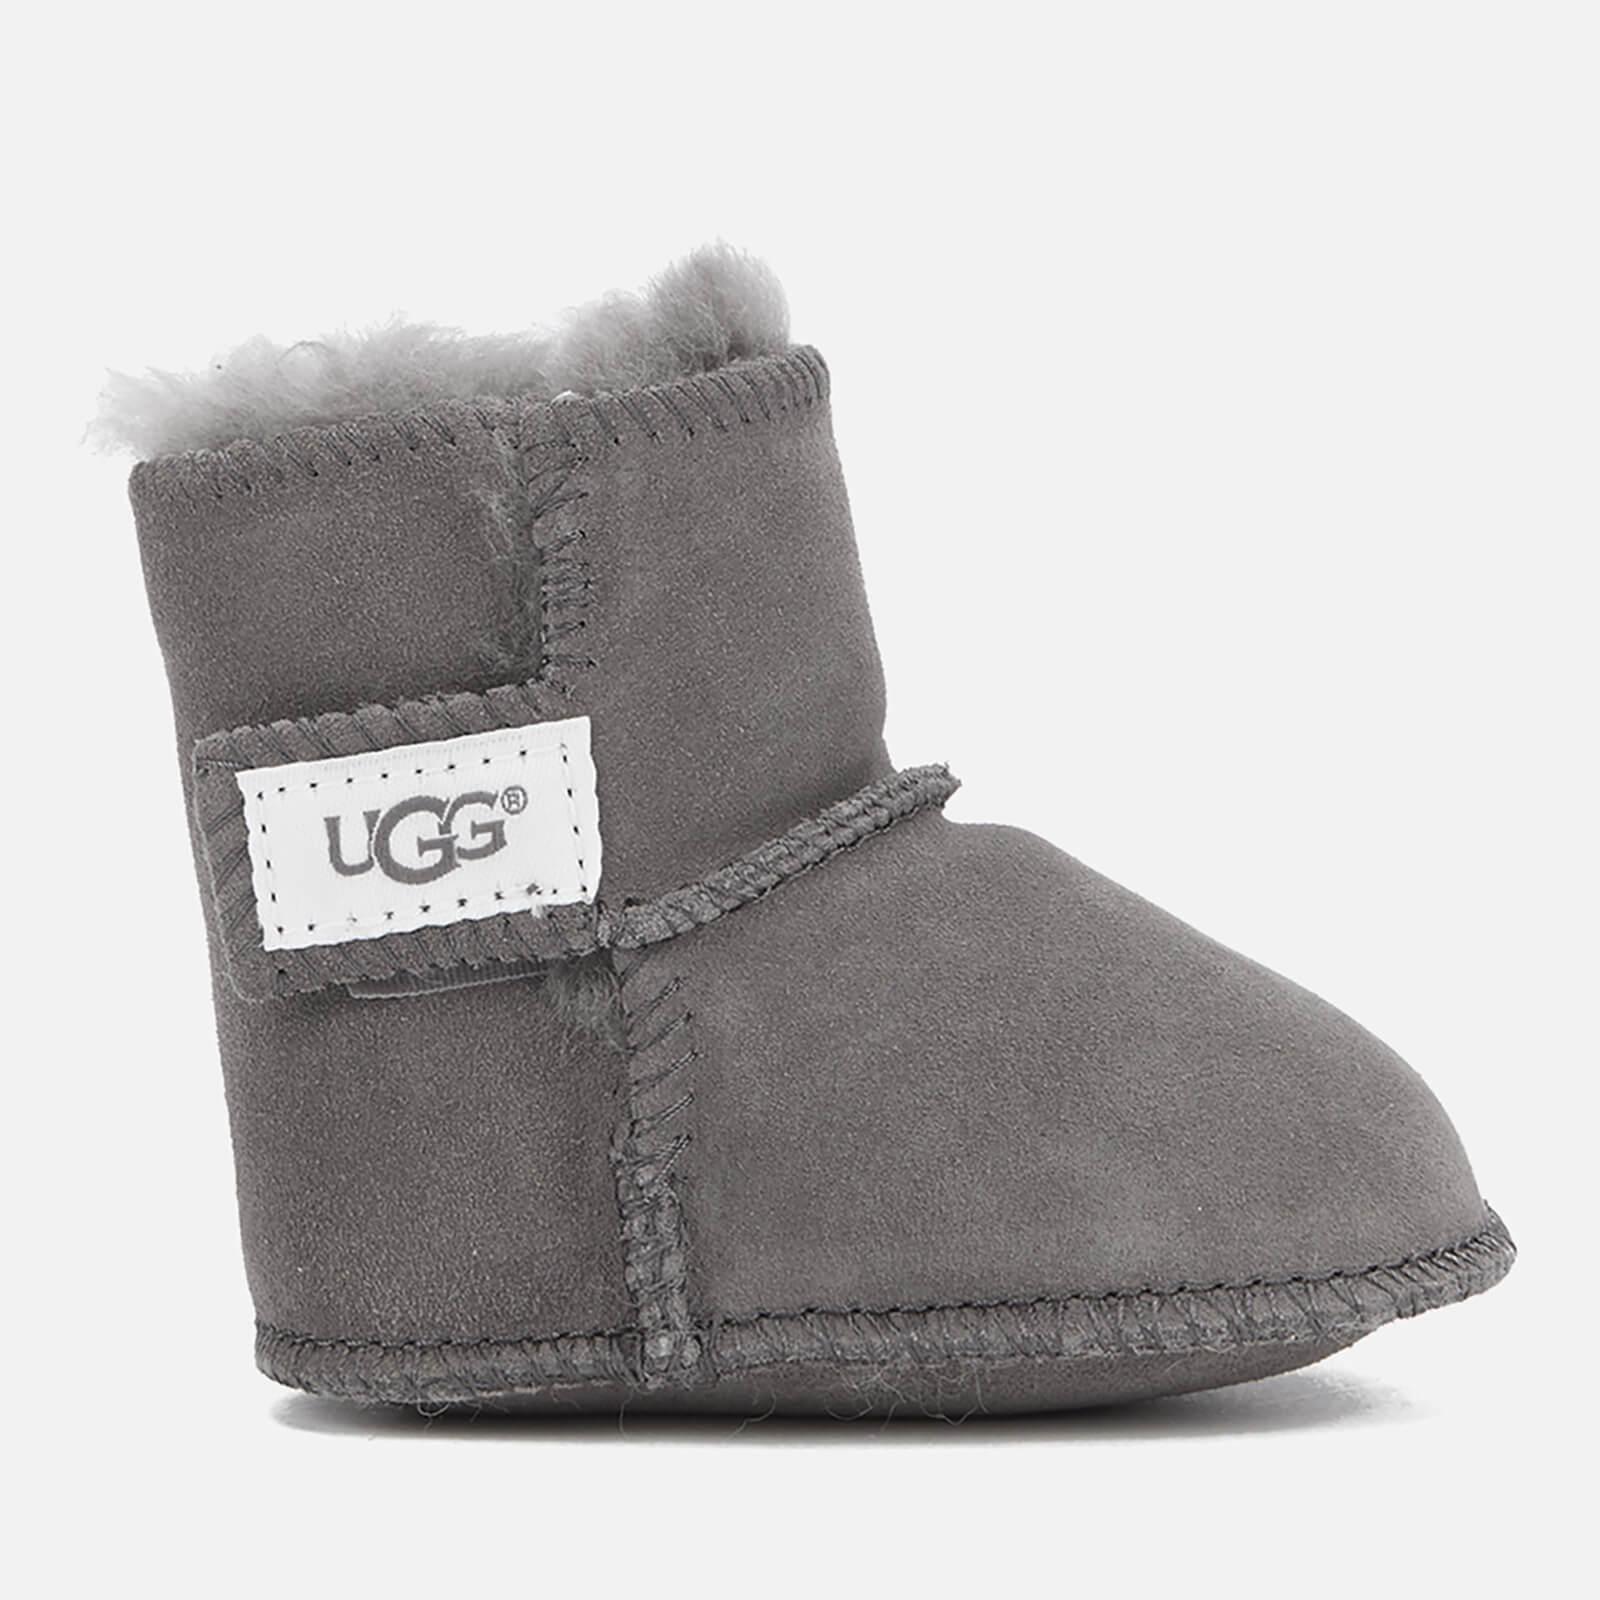 5d5ac95af68 UGG Babies' Erin Suede Boots - Charcoal